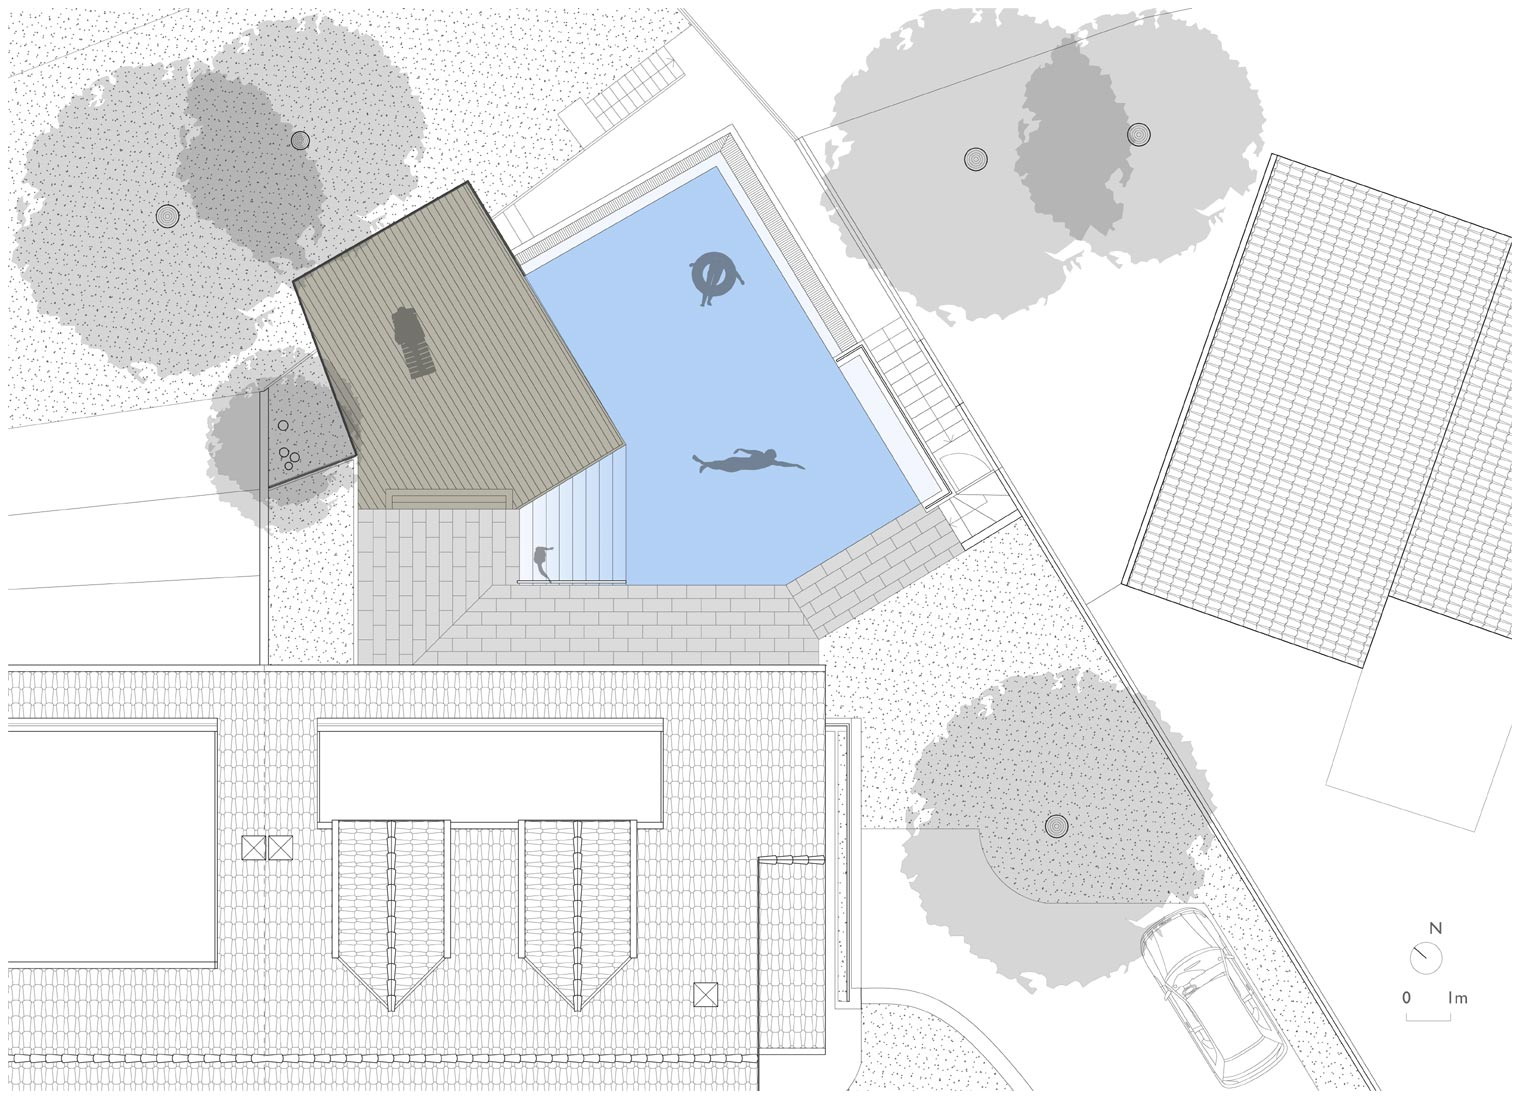 vk-architetti_poolp_plan